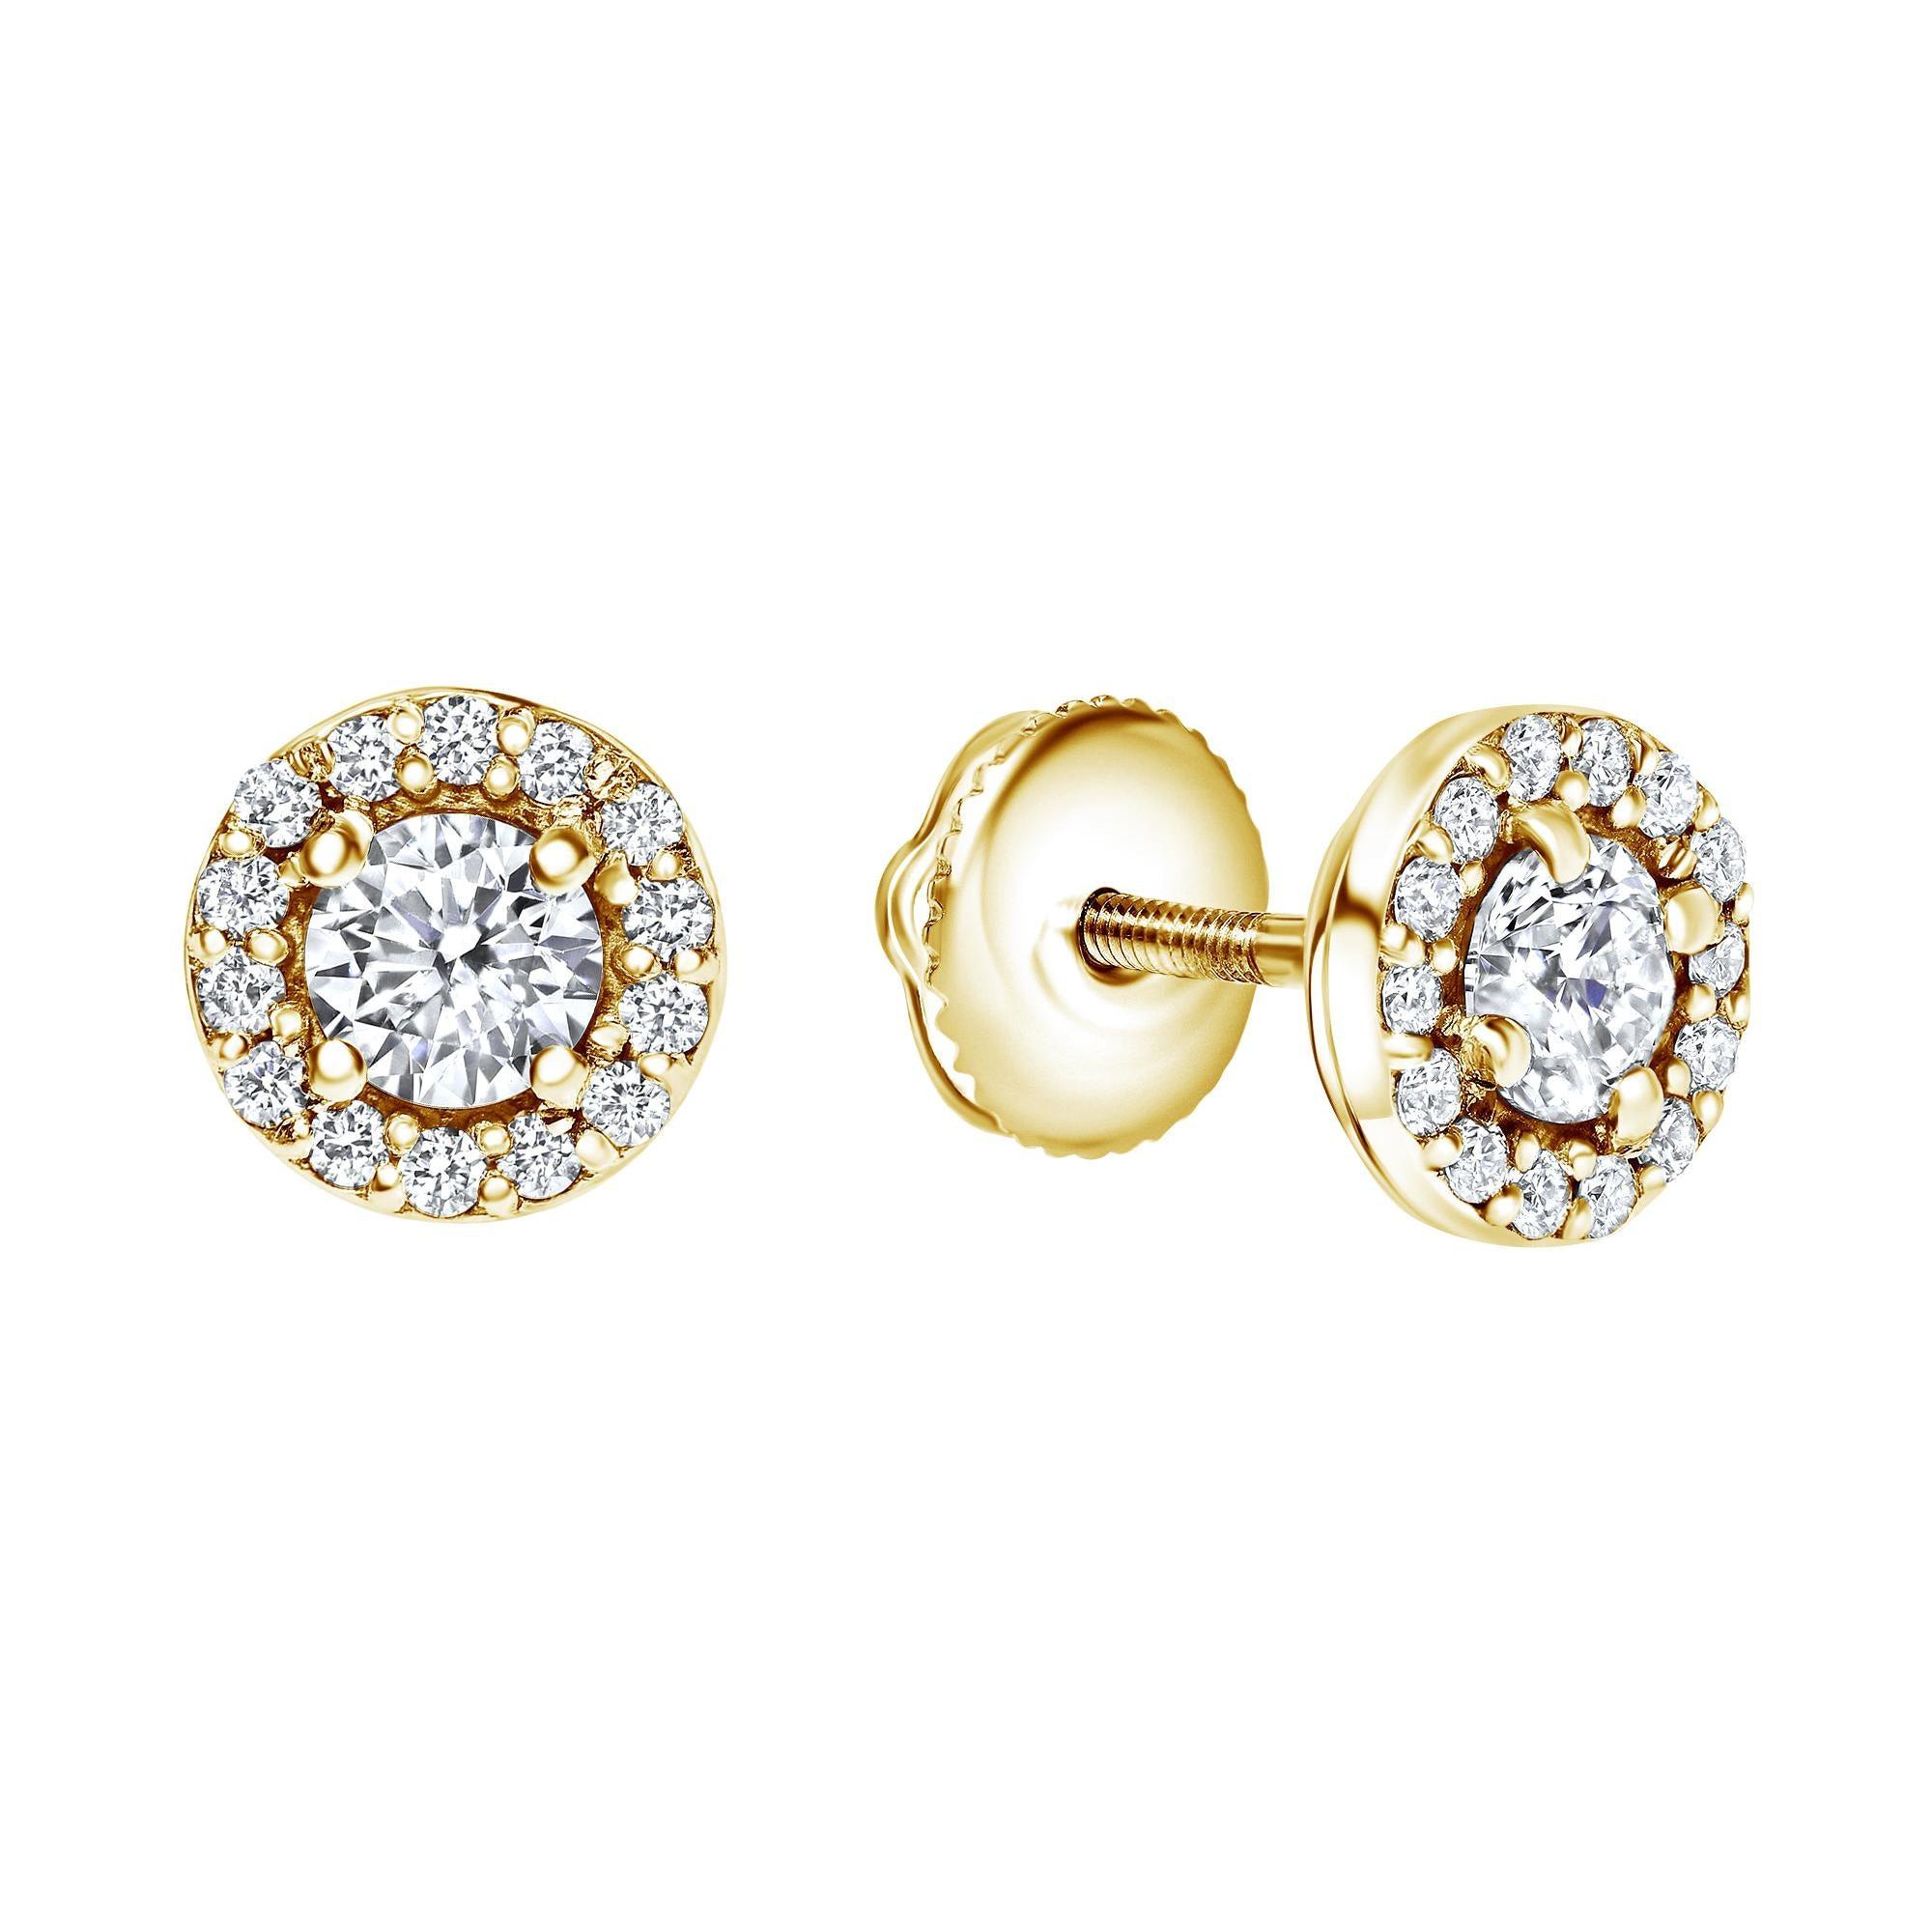 0.68 Carat Diamond Midi Halo Earrings in 14 Karat Yellow Gold, Shlomit Rogel